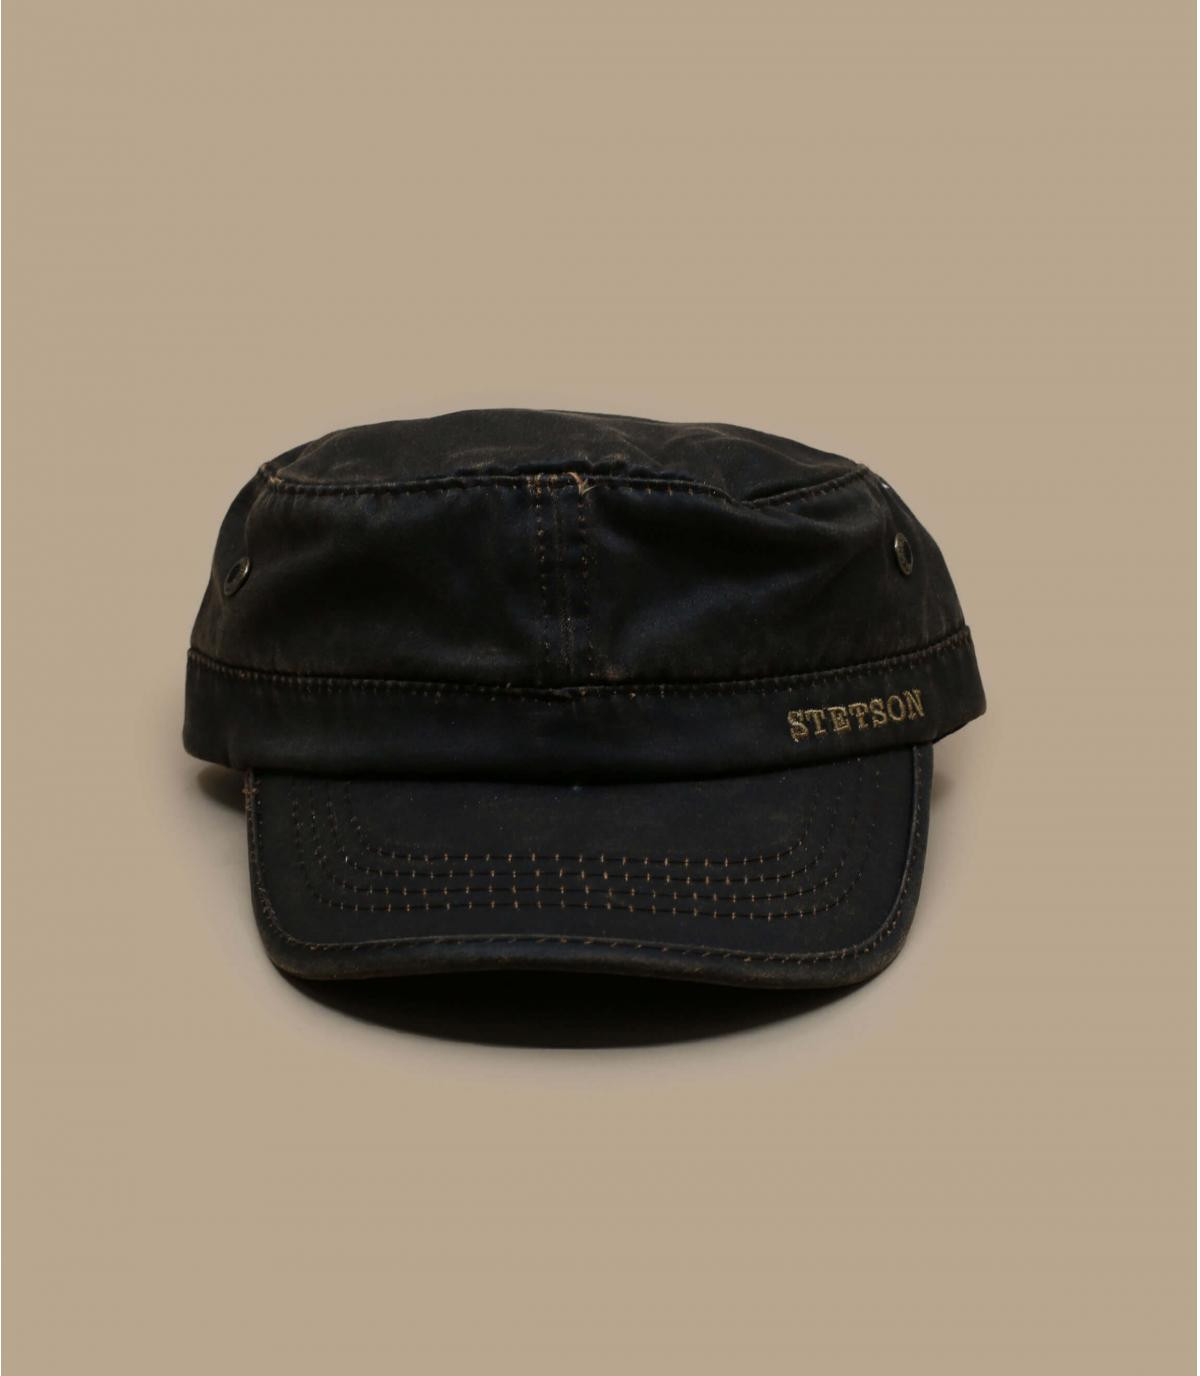 Brown army cap